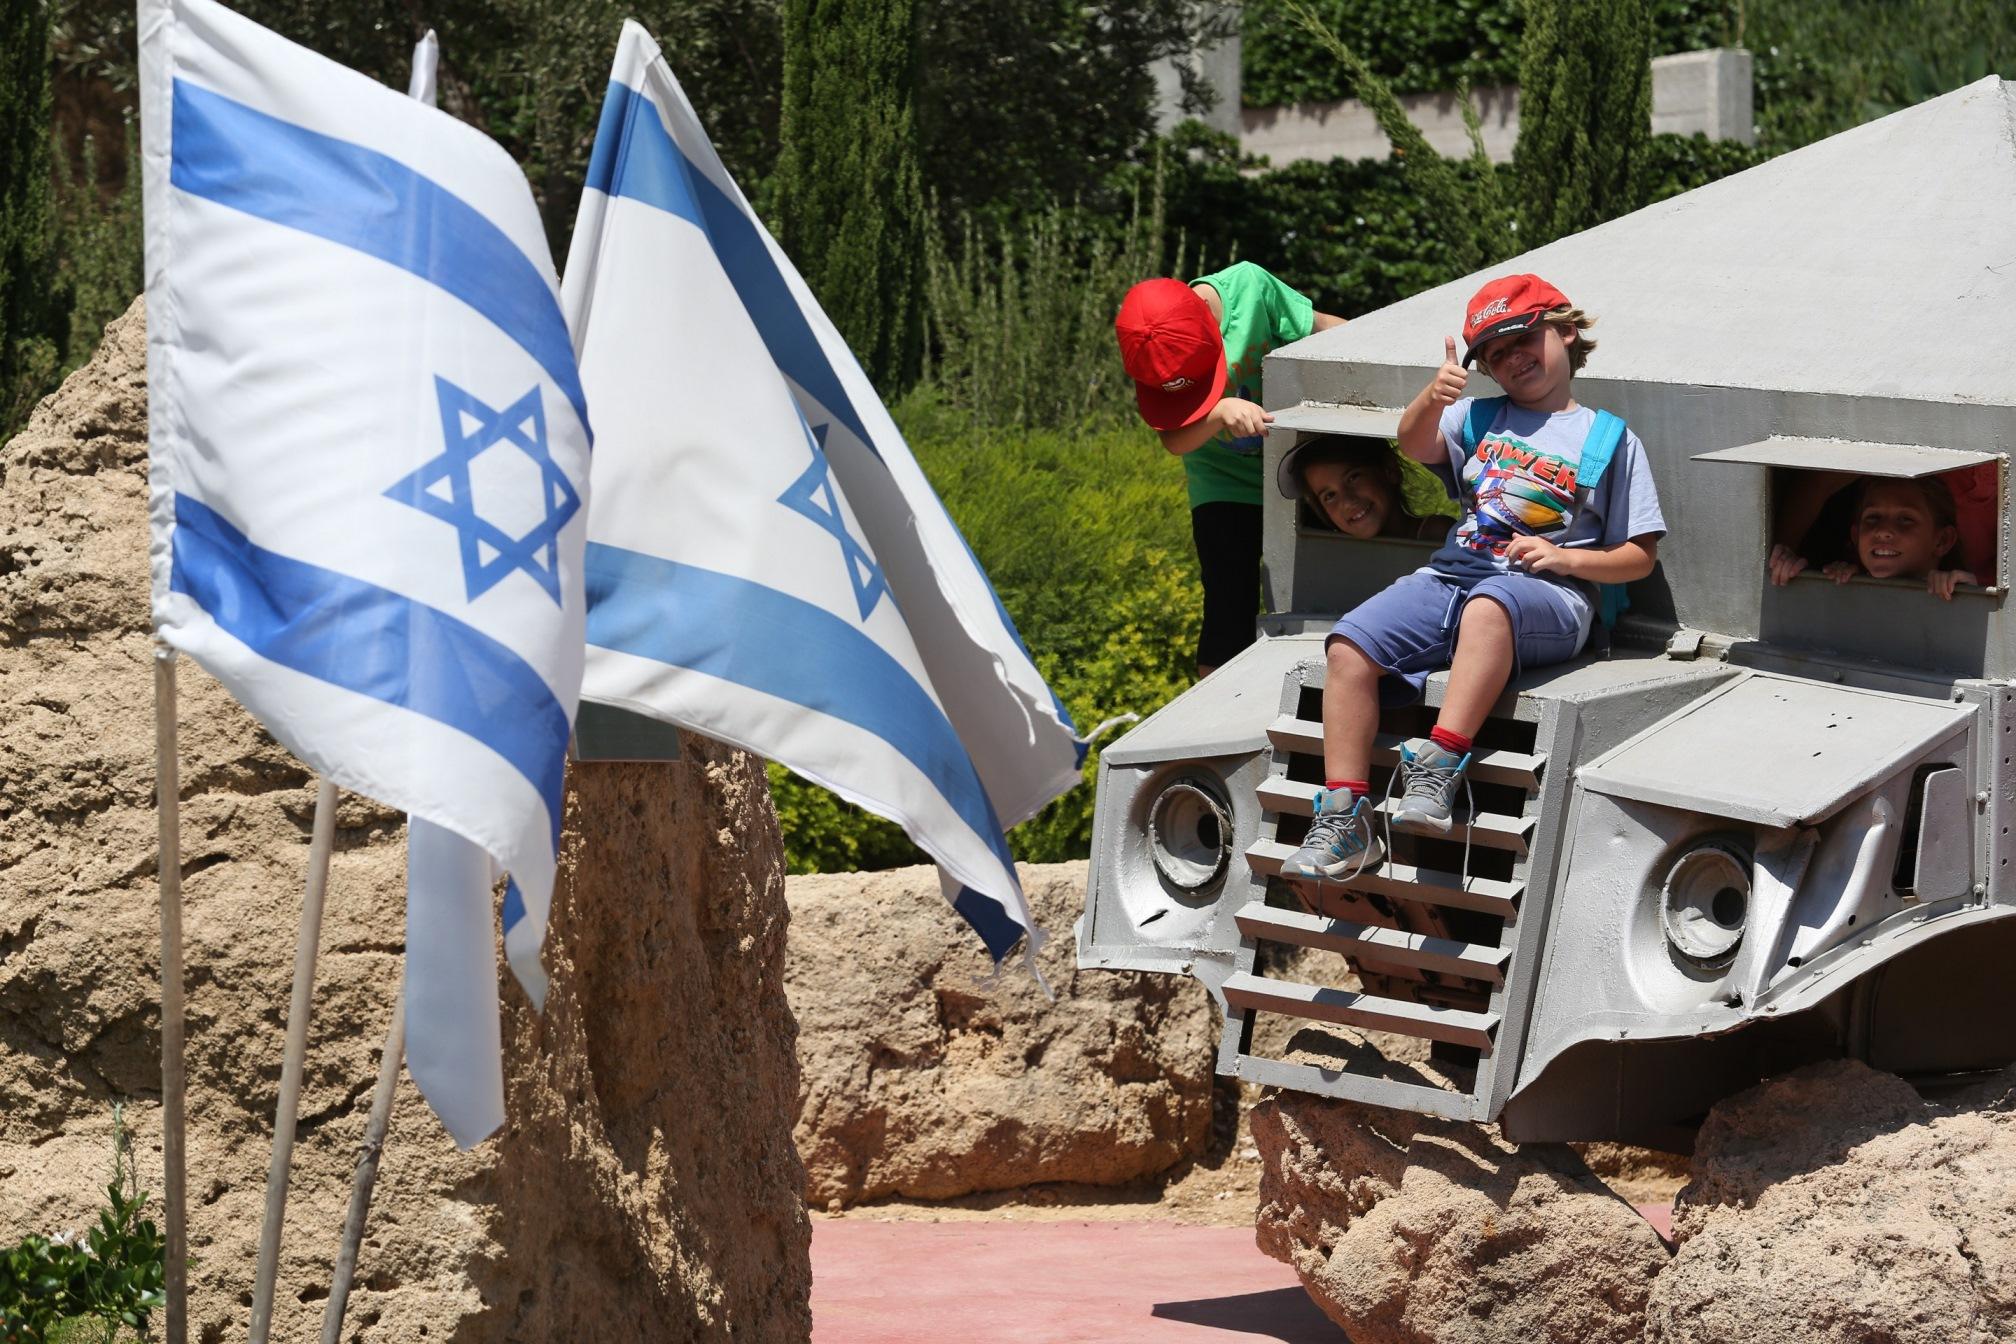 Photo of יום הולדת שמח ישראל: 71 אתרי מורשת נפתחים ללא תשלום ביום העצמאות